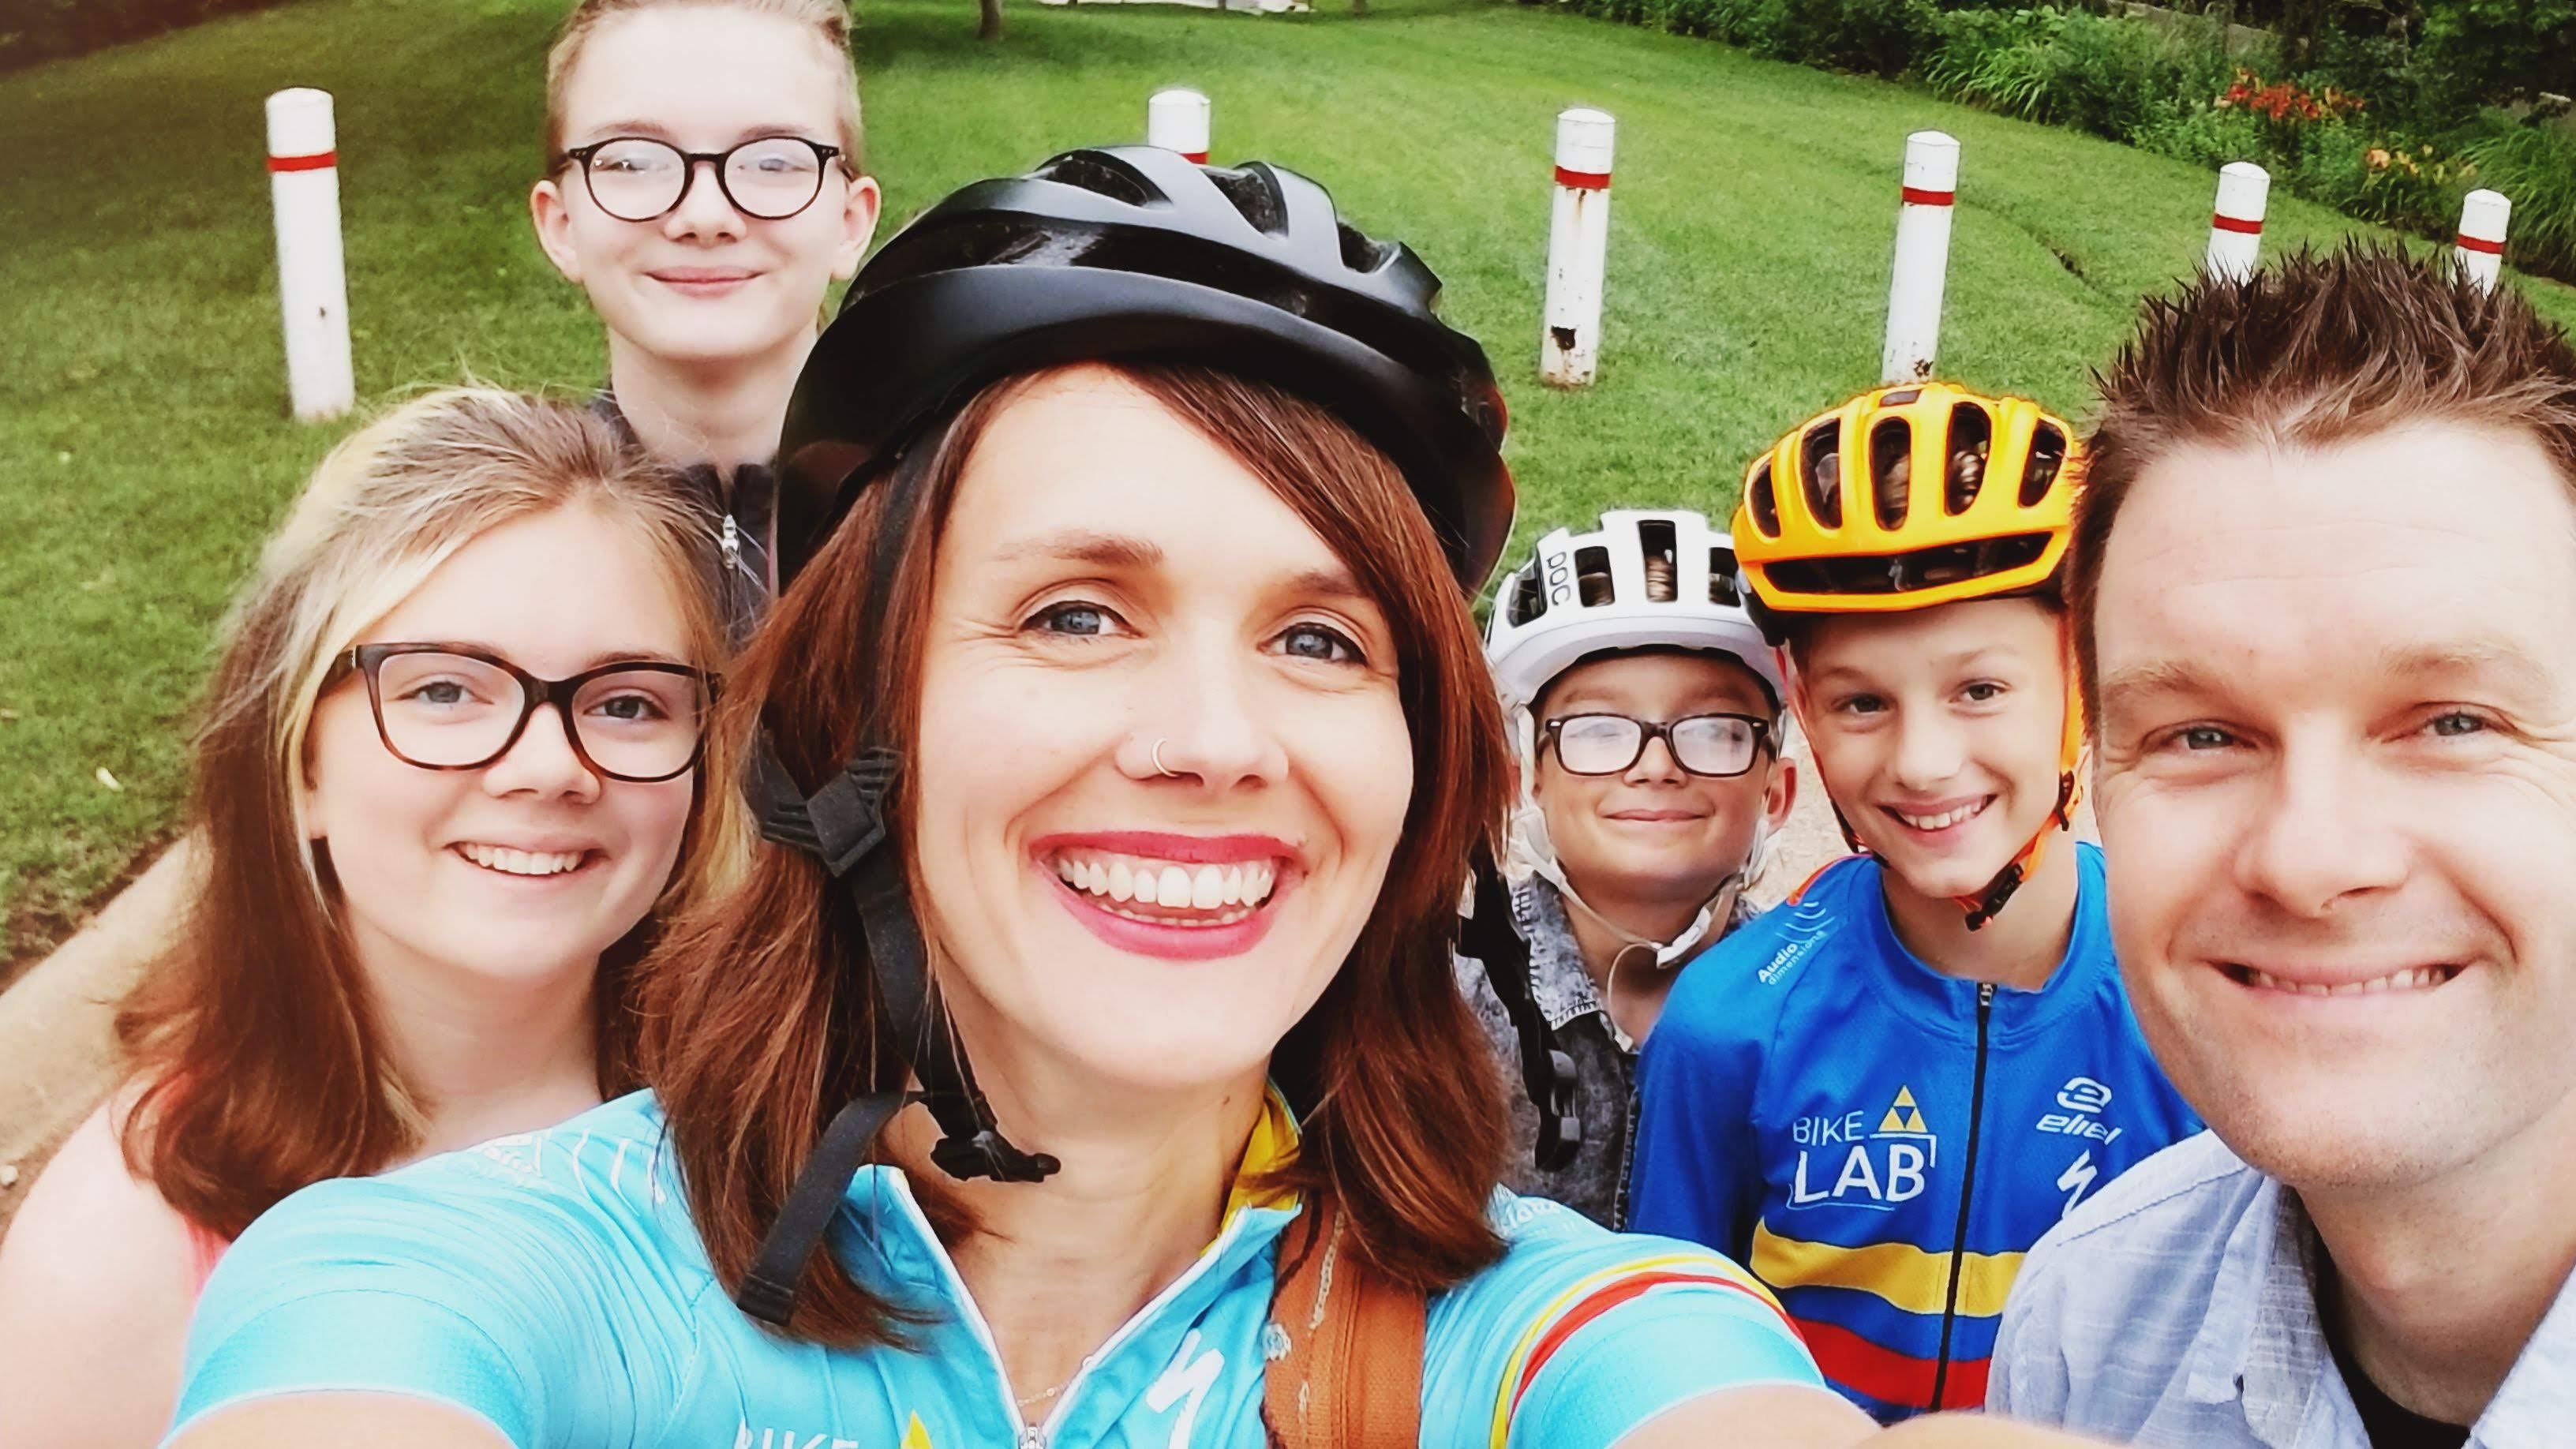 the bike lab team photo